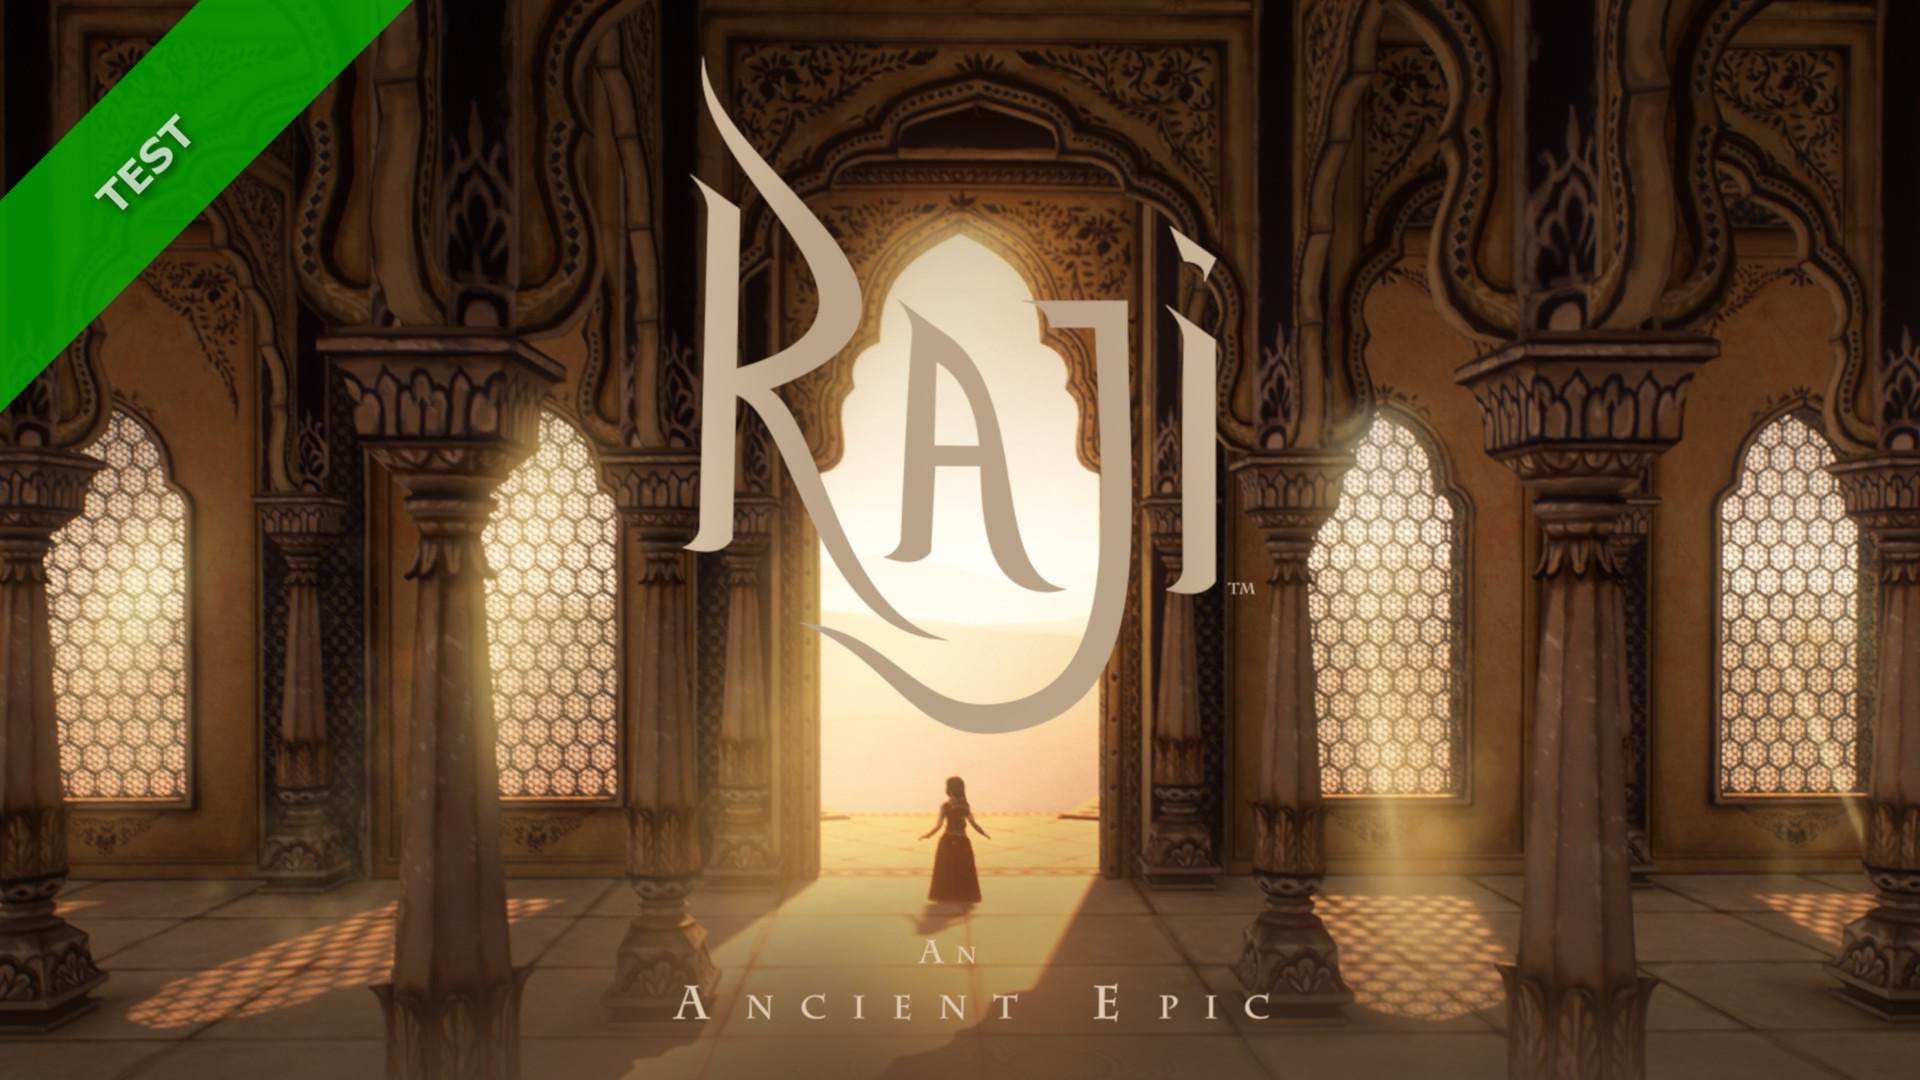 TEST Raji An Ancient Epic XWFR